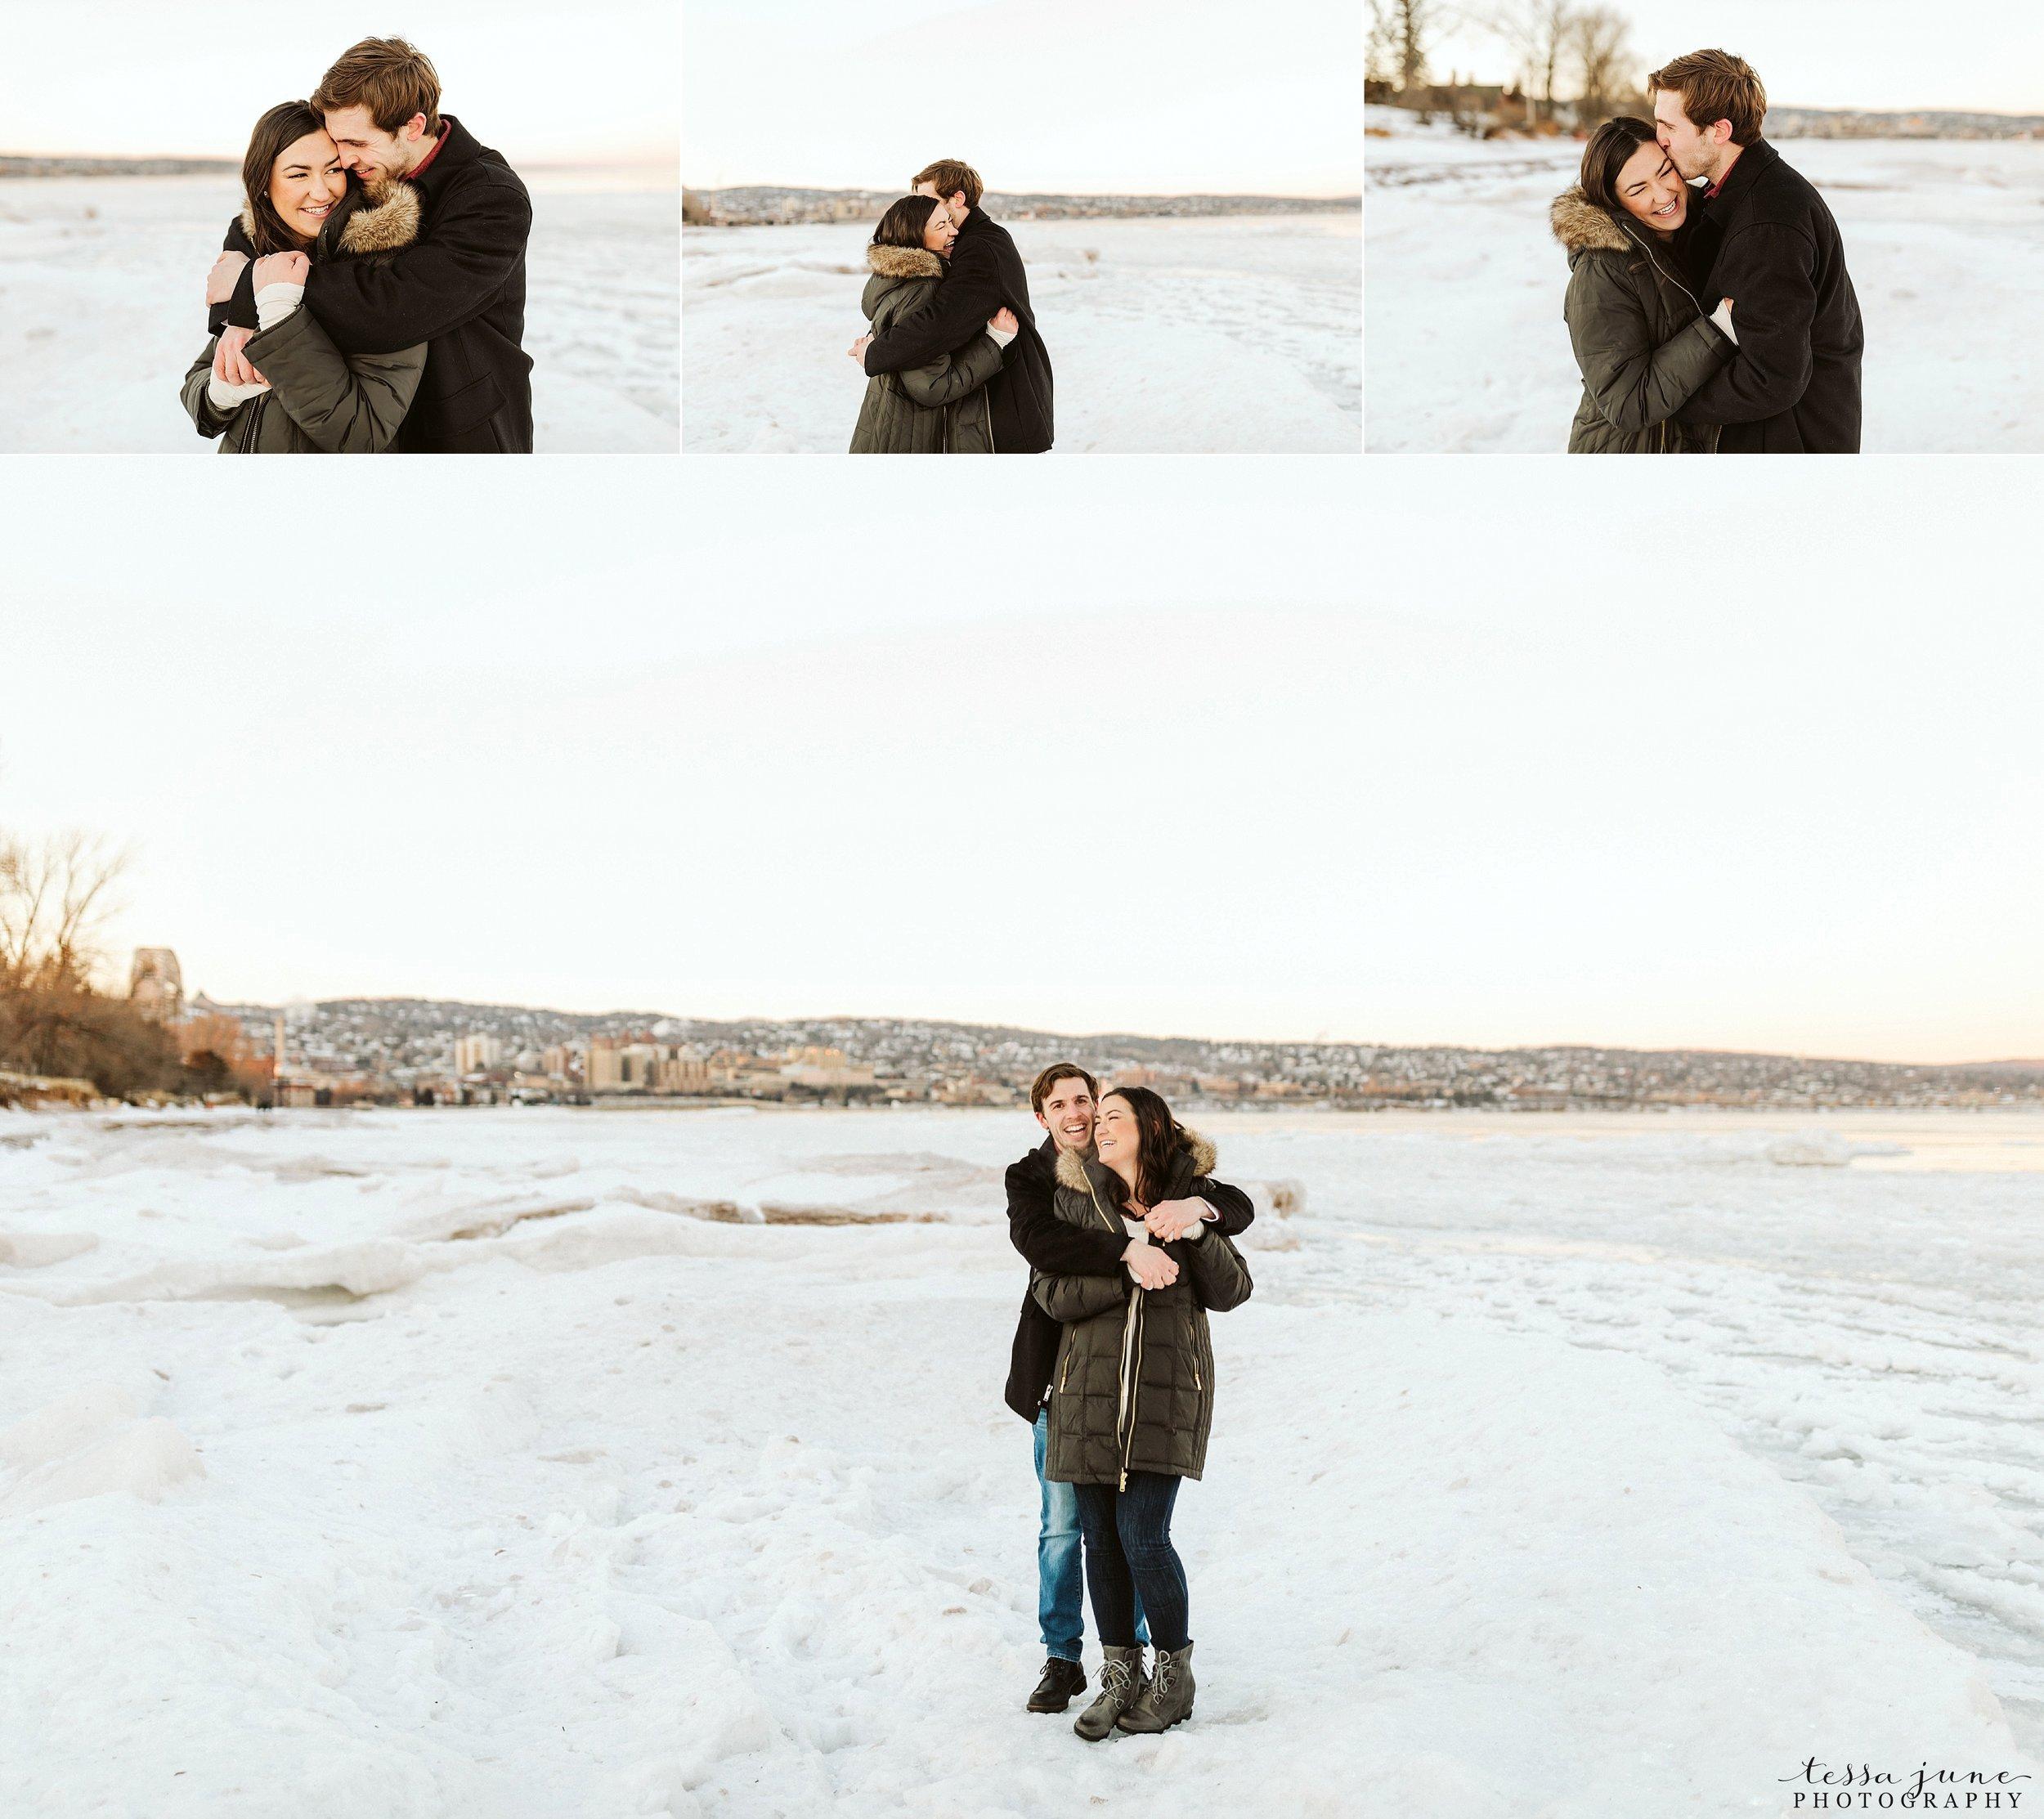 winter-duluth-engagement-at-park-pointe-snow-aly-alex-46.jpg